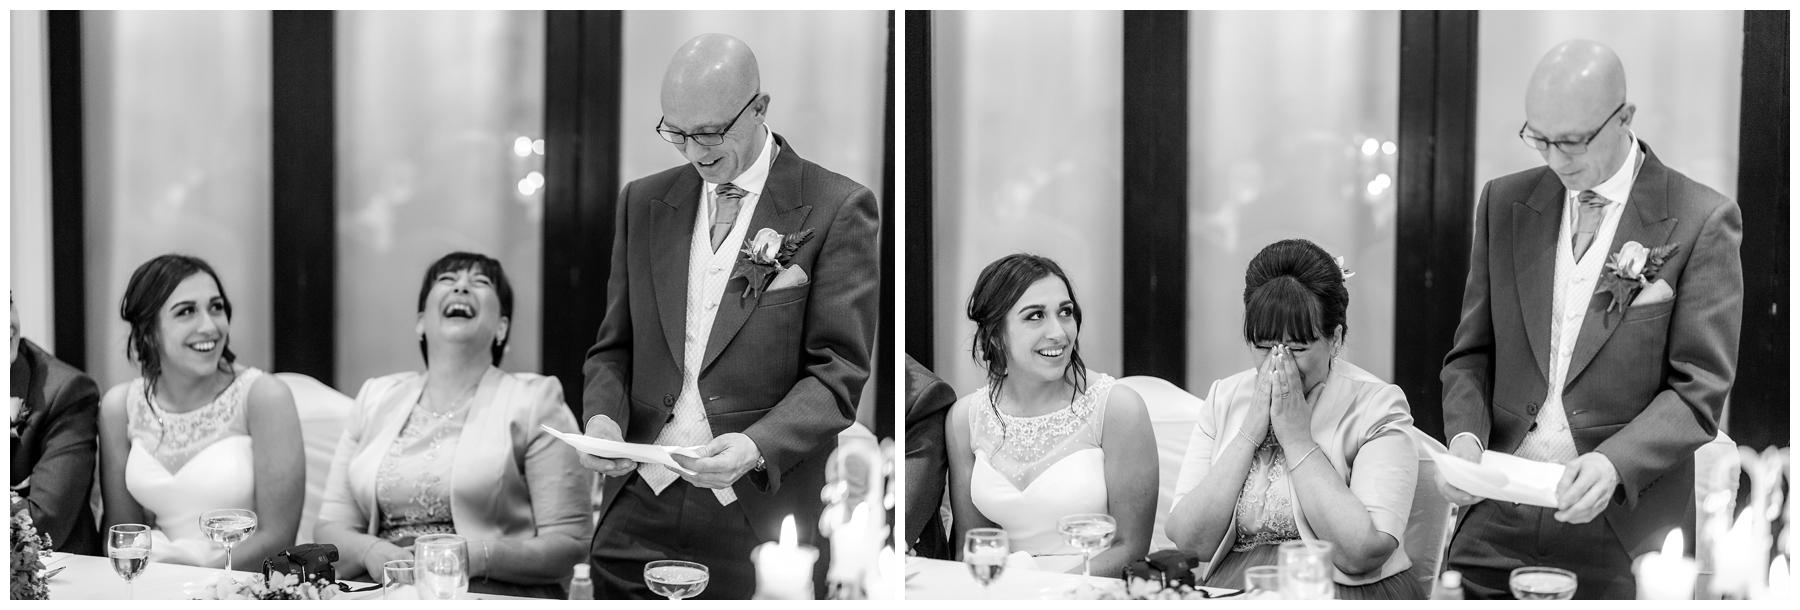 holland-hall-wedding-photography-becky-jason_0038.jpg